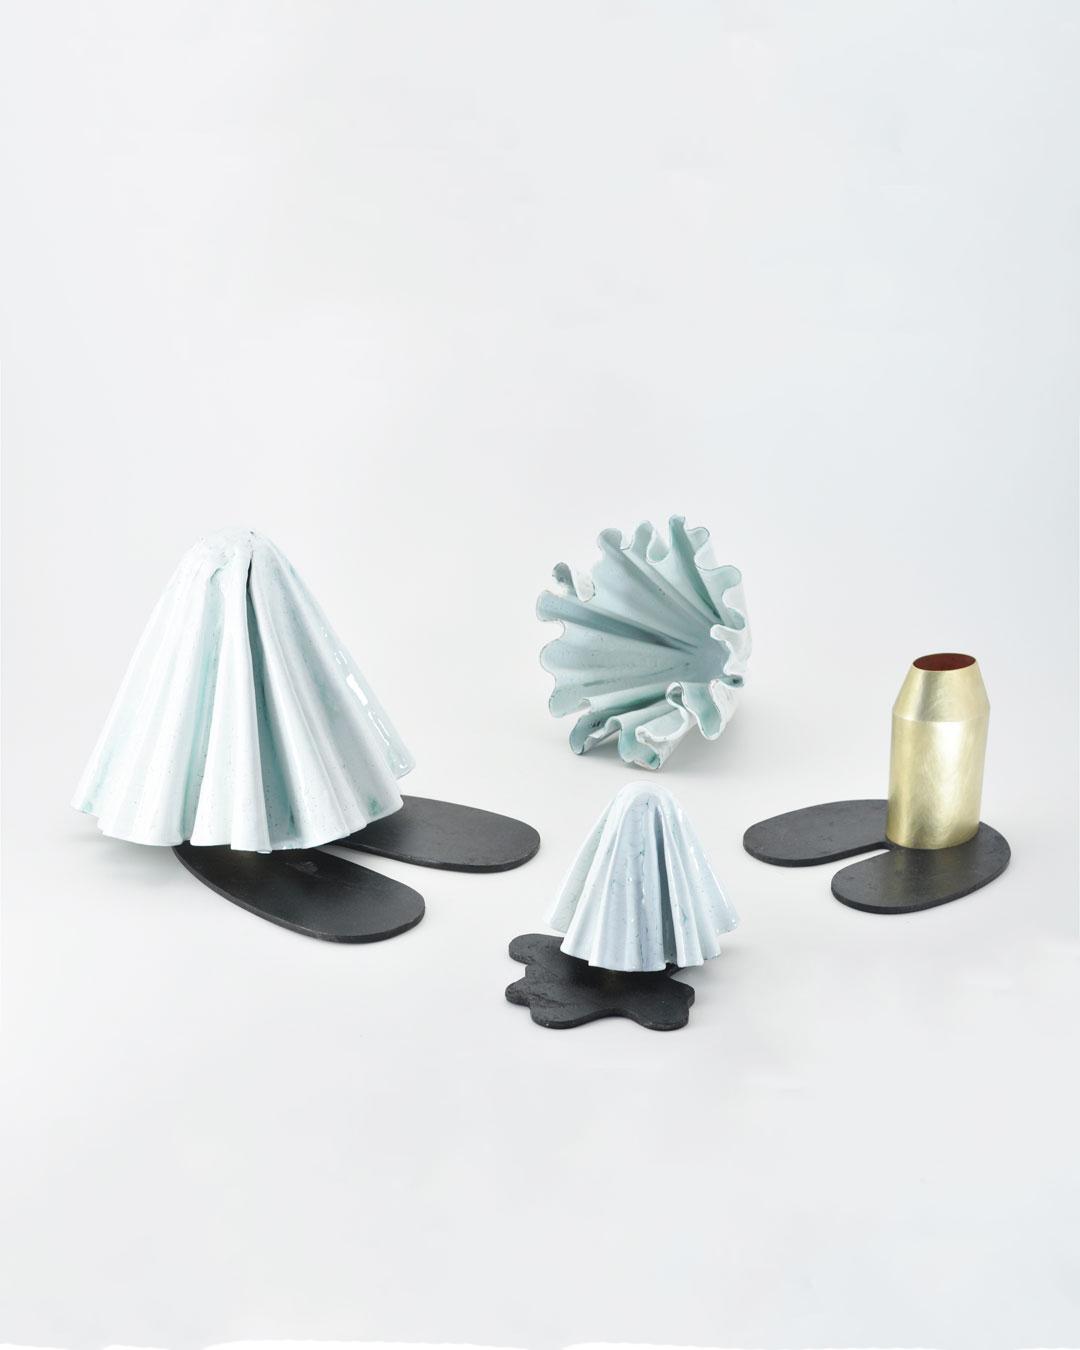 Anders Ljungberg, Pose, 2019, objects; brass, steel, enamelled copper, 260 x 250 x 330 mm / 190 x 195 x 185 mm / 120 x 155 x 185 mm, €7750